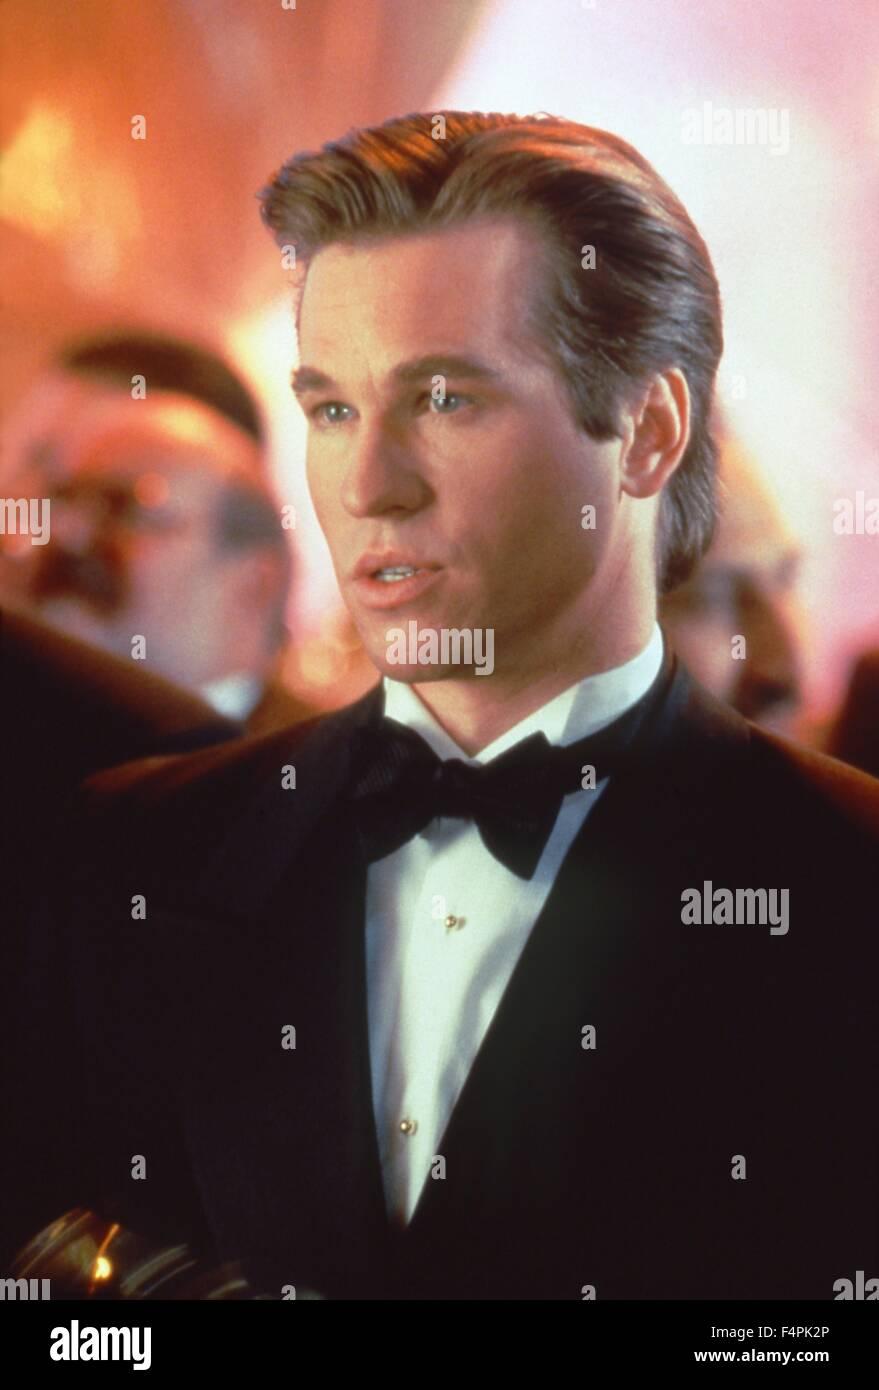 Val Kilmer / Batman Forever / 1995 directed by Joel Schumacher [Warner Bros. Pictures] - Stock Image